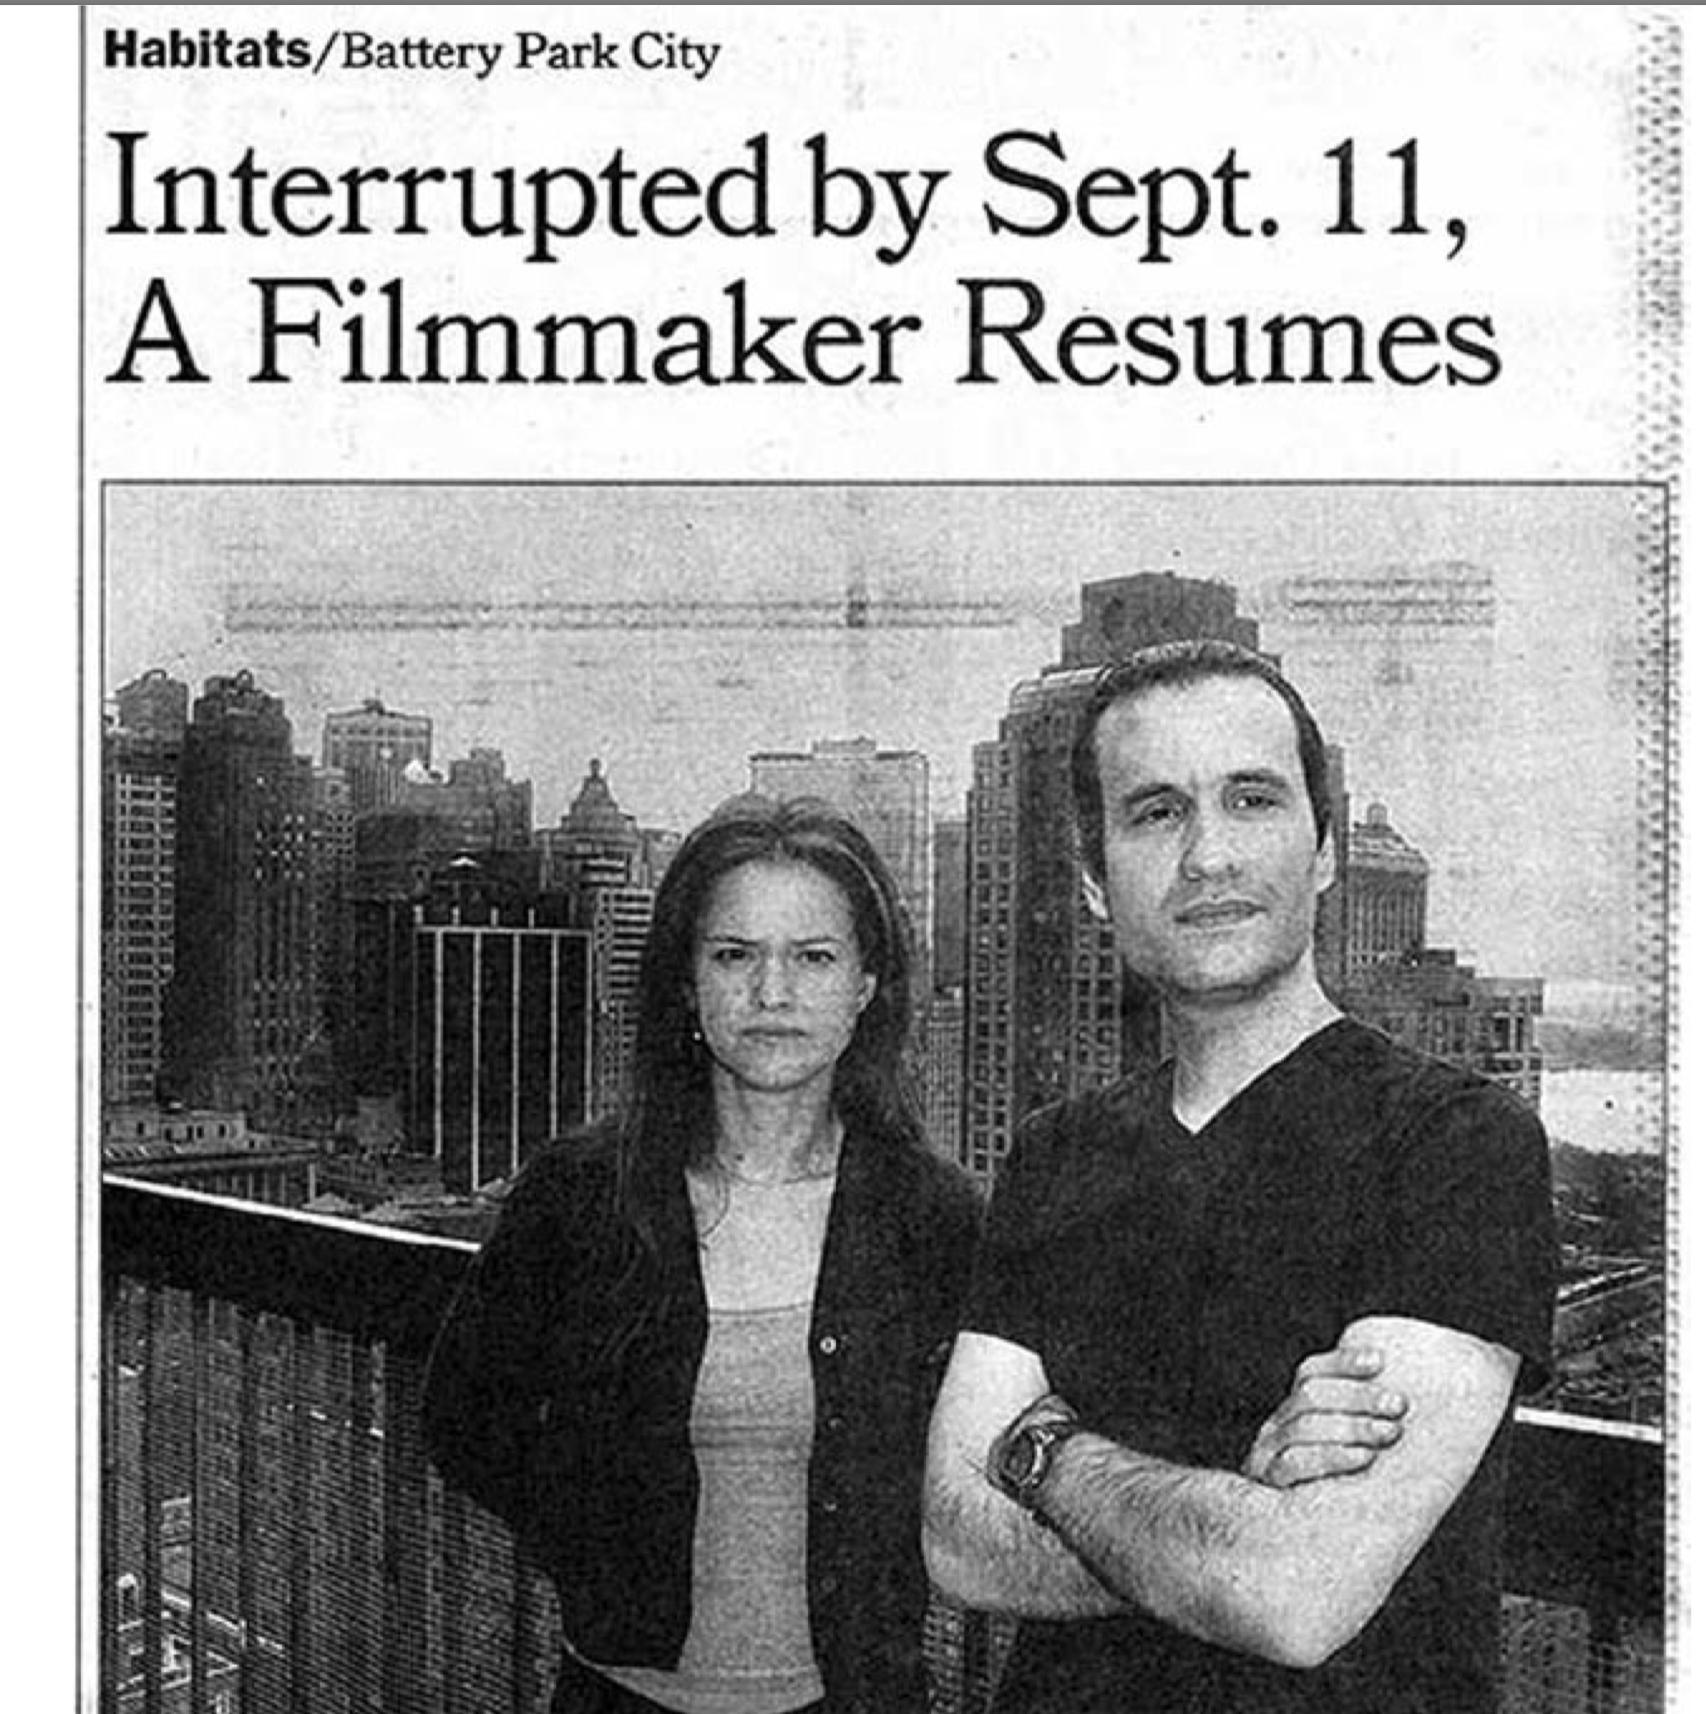 New-York-Times-Press-Jennifer-Elster-Habitats:Battery-Park-City-Interrupted-by-Sept.11-A-Filmmaker-Resumes.png